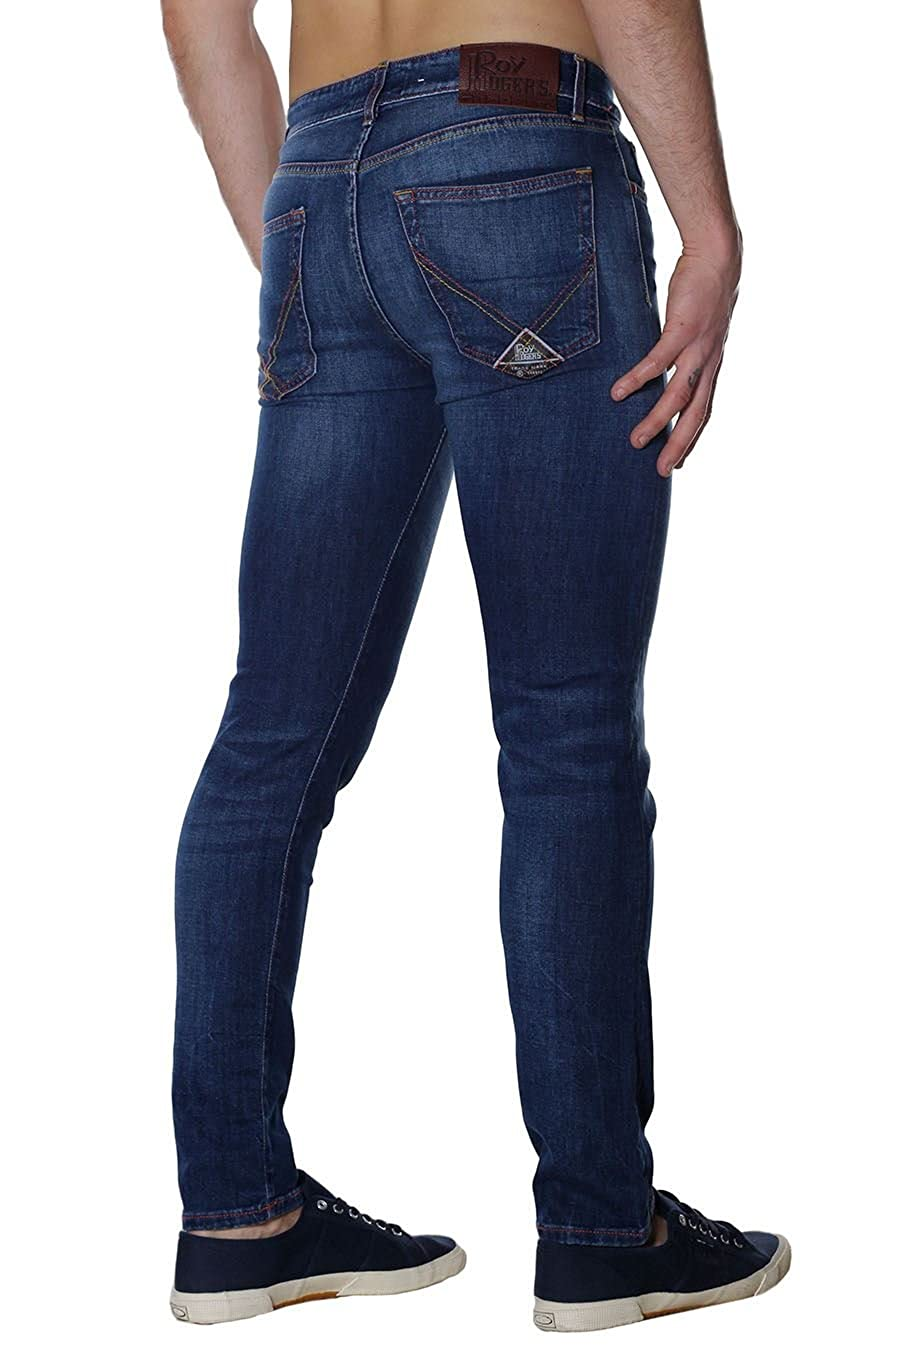 Jeans Uomo Apua Roy Roger's Roger's Roy RIU001D1410658 MainApps cc7119